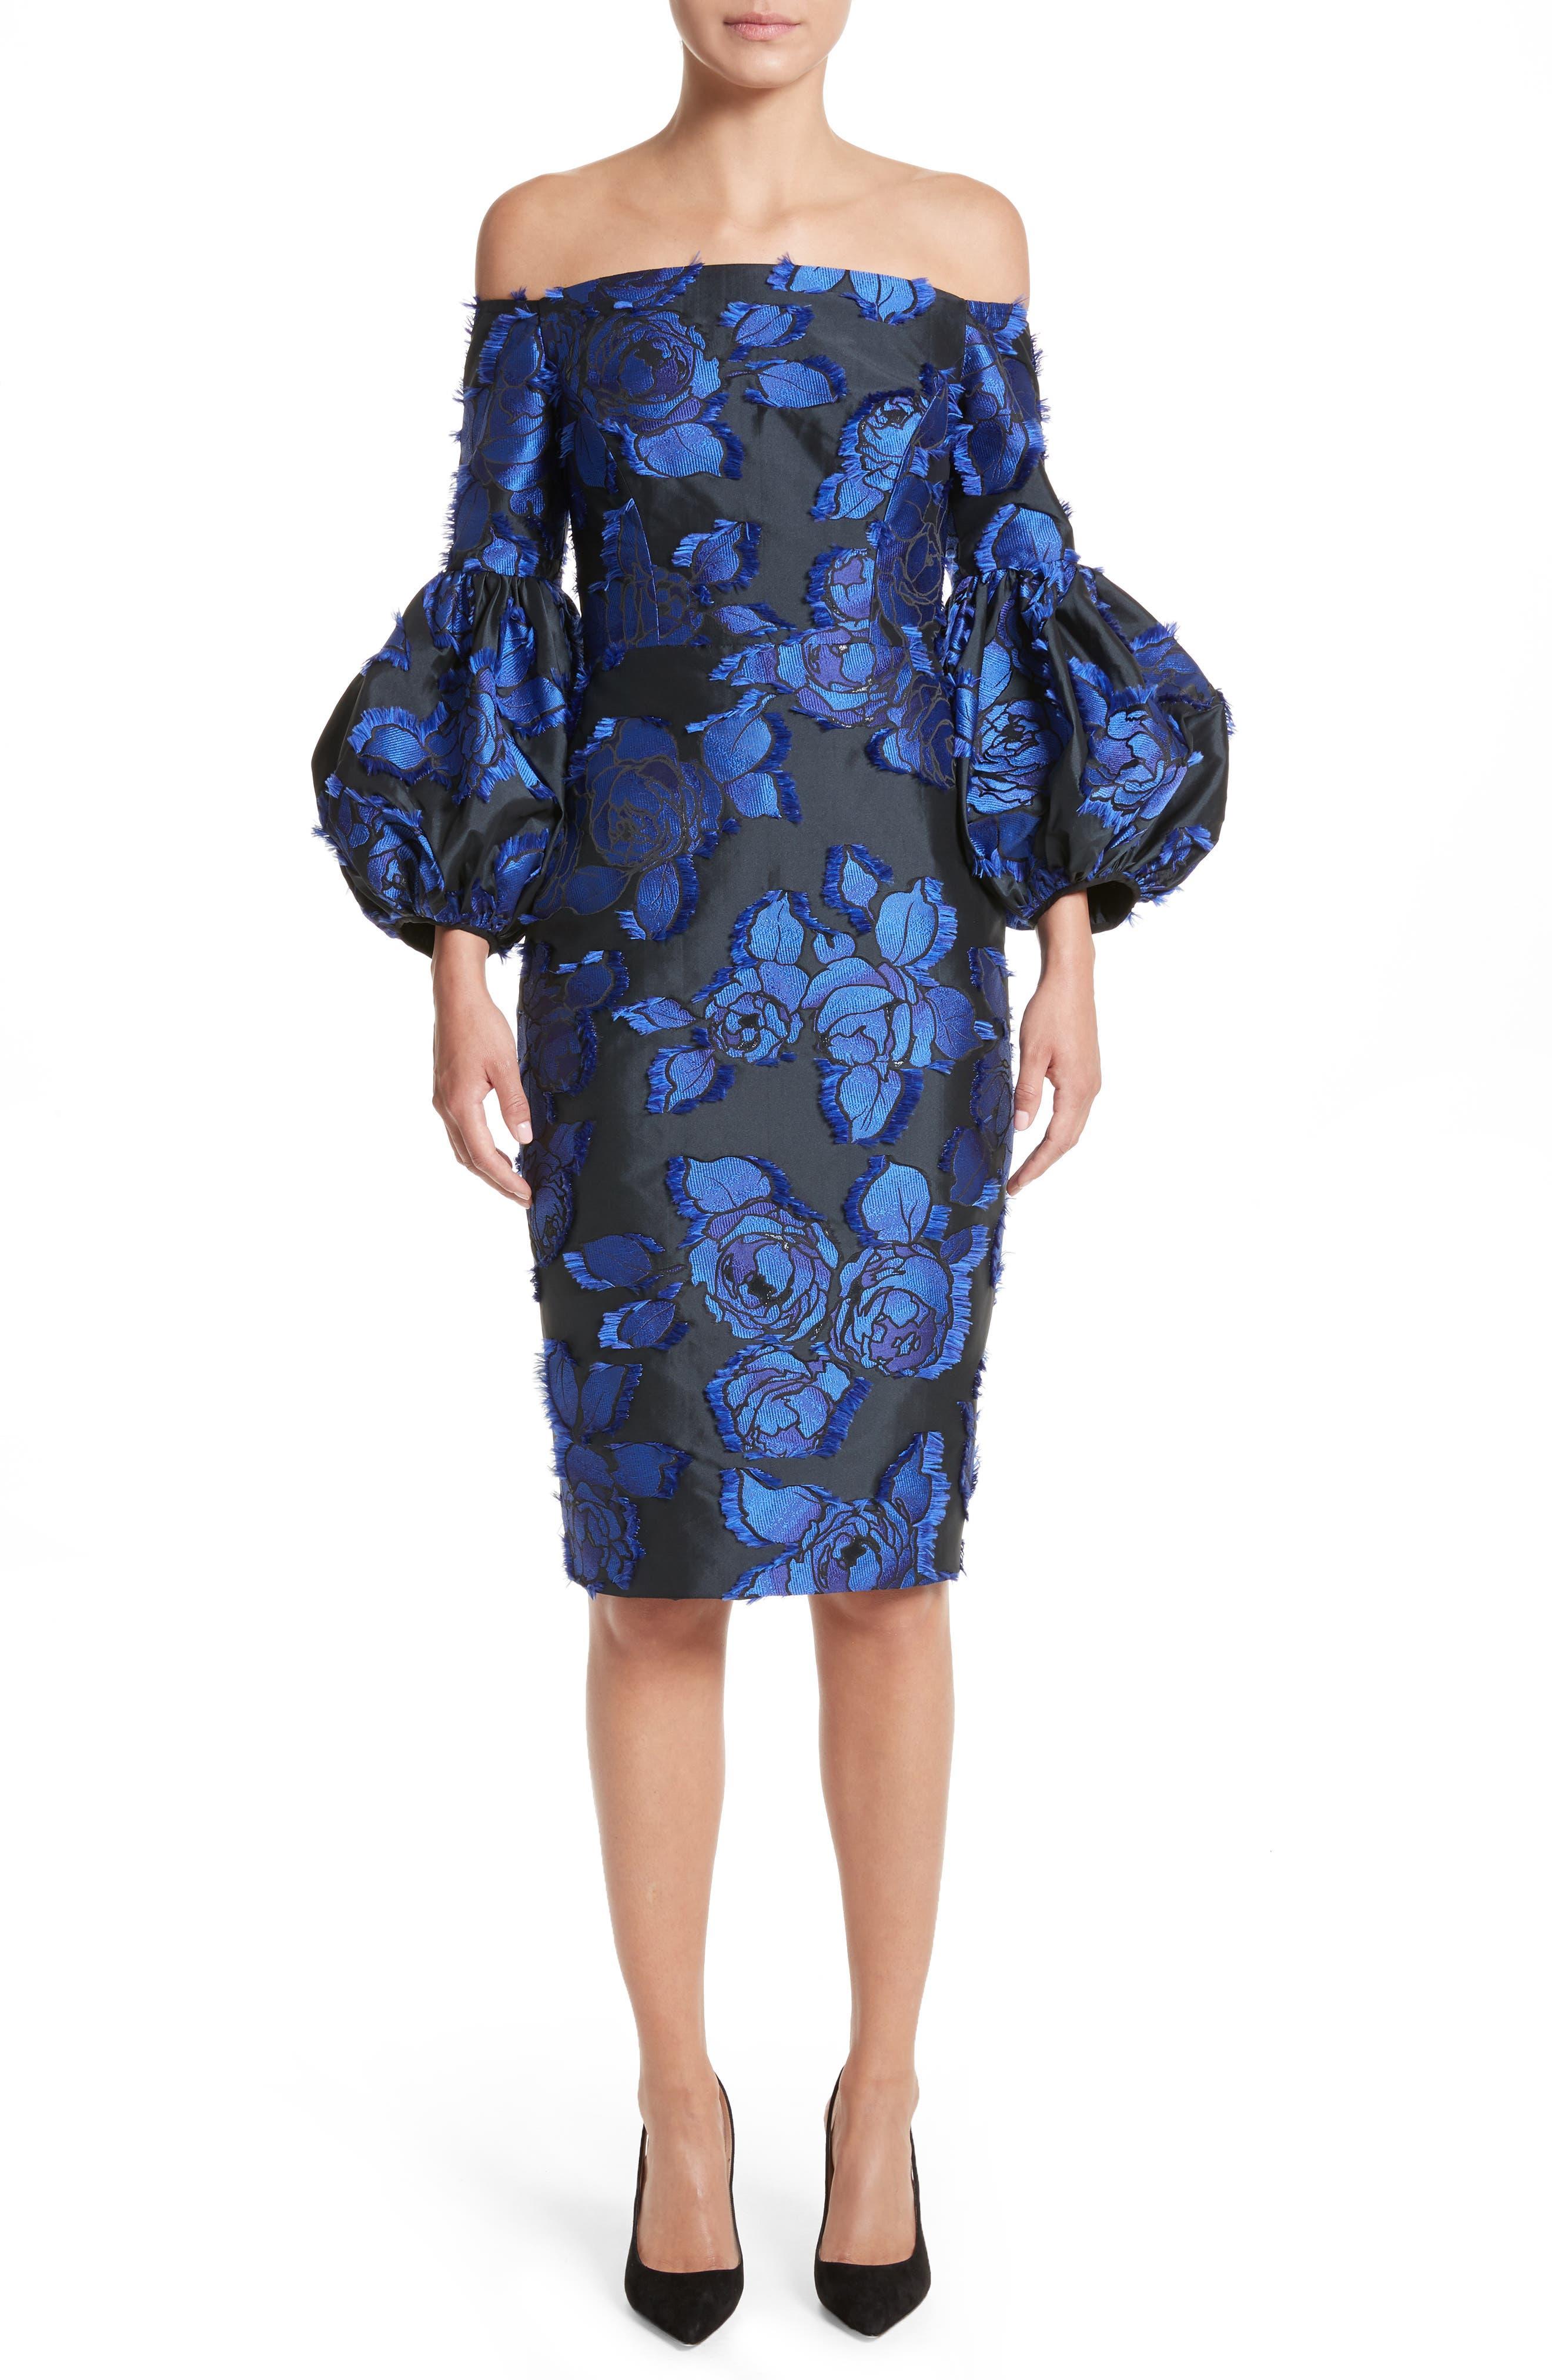 Fring Brocade Puff Sleeve Dress,                         Main,                         color, Black/ Lapis